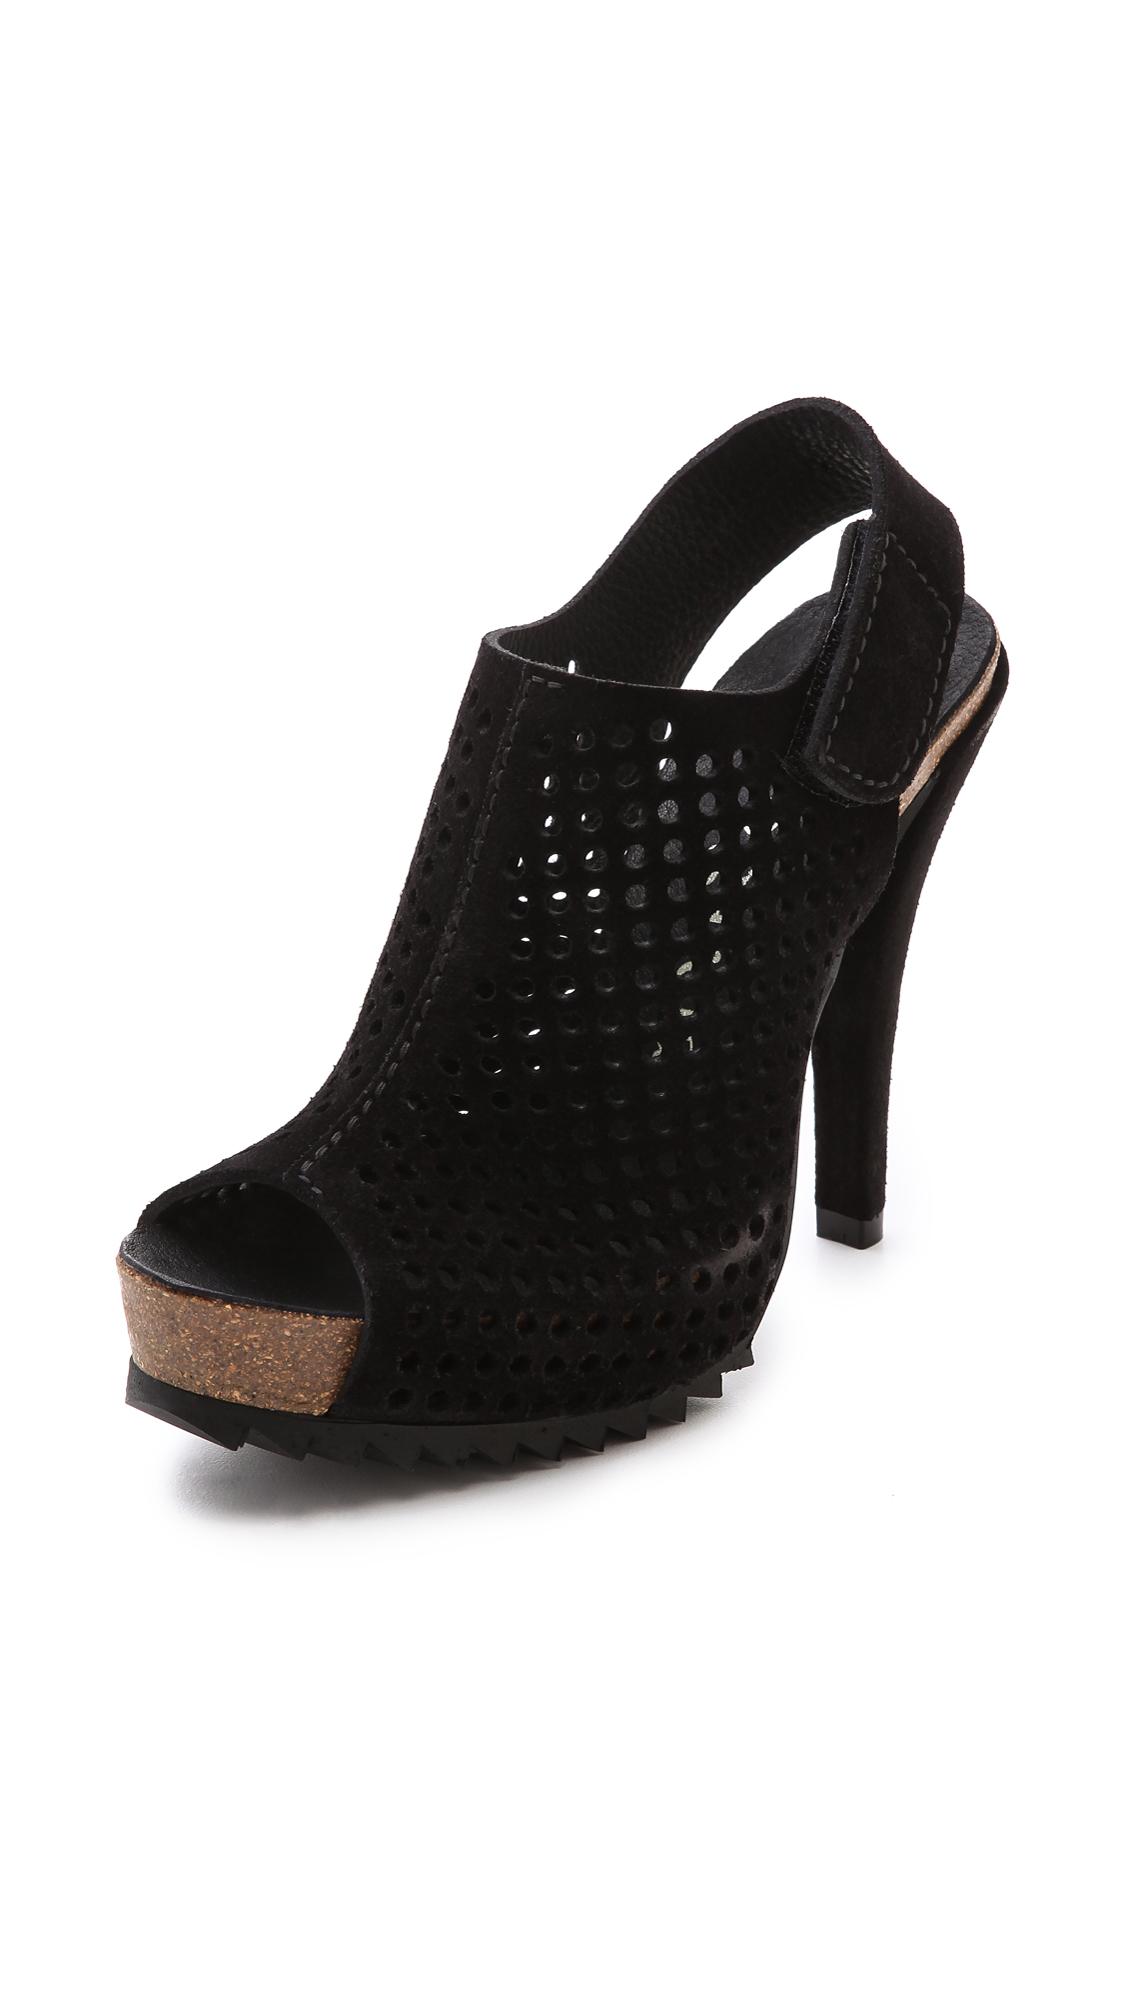 Innovative By Hudson Sherbert Low Heel Sandals In Black  Lyst